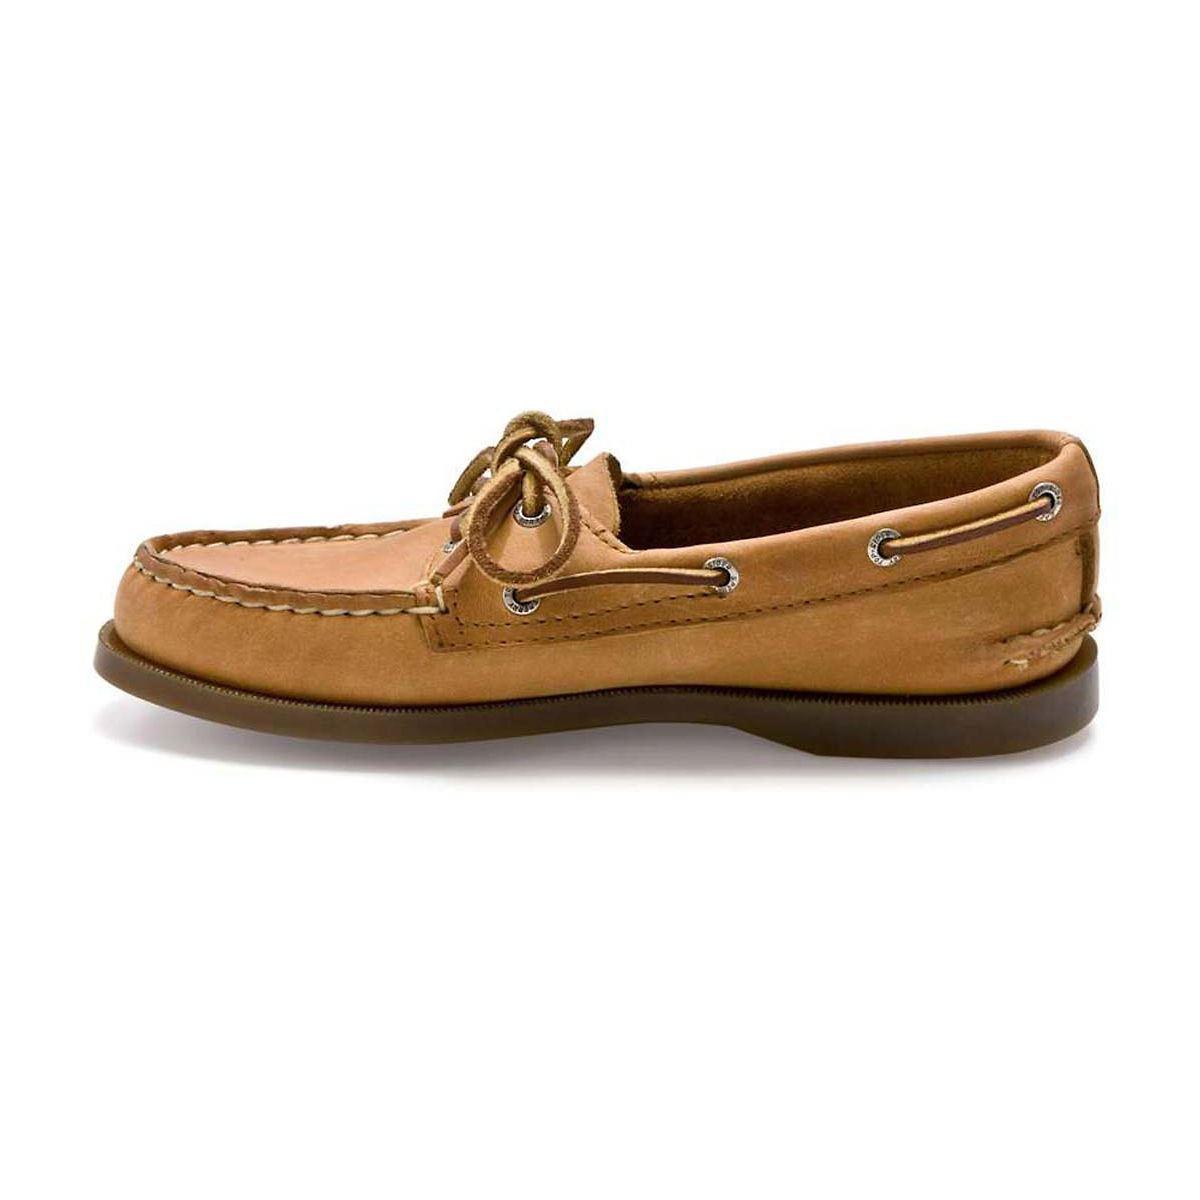 Sperry Womens Authentic Original 2 Eye Boat Shoe Sahara